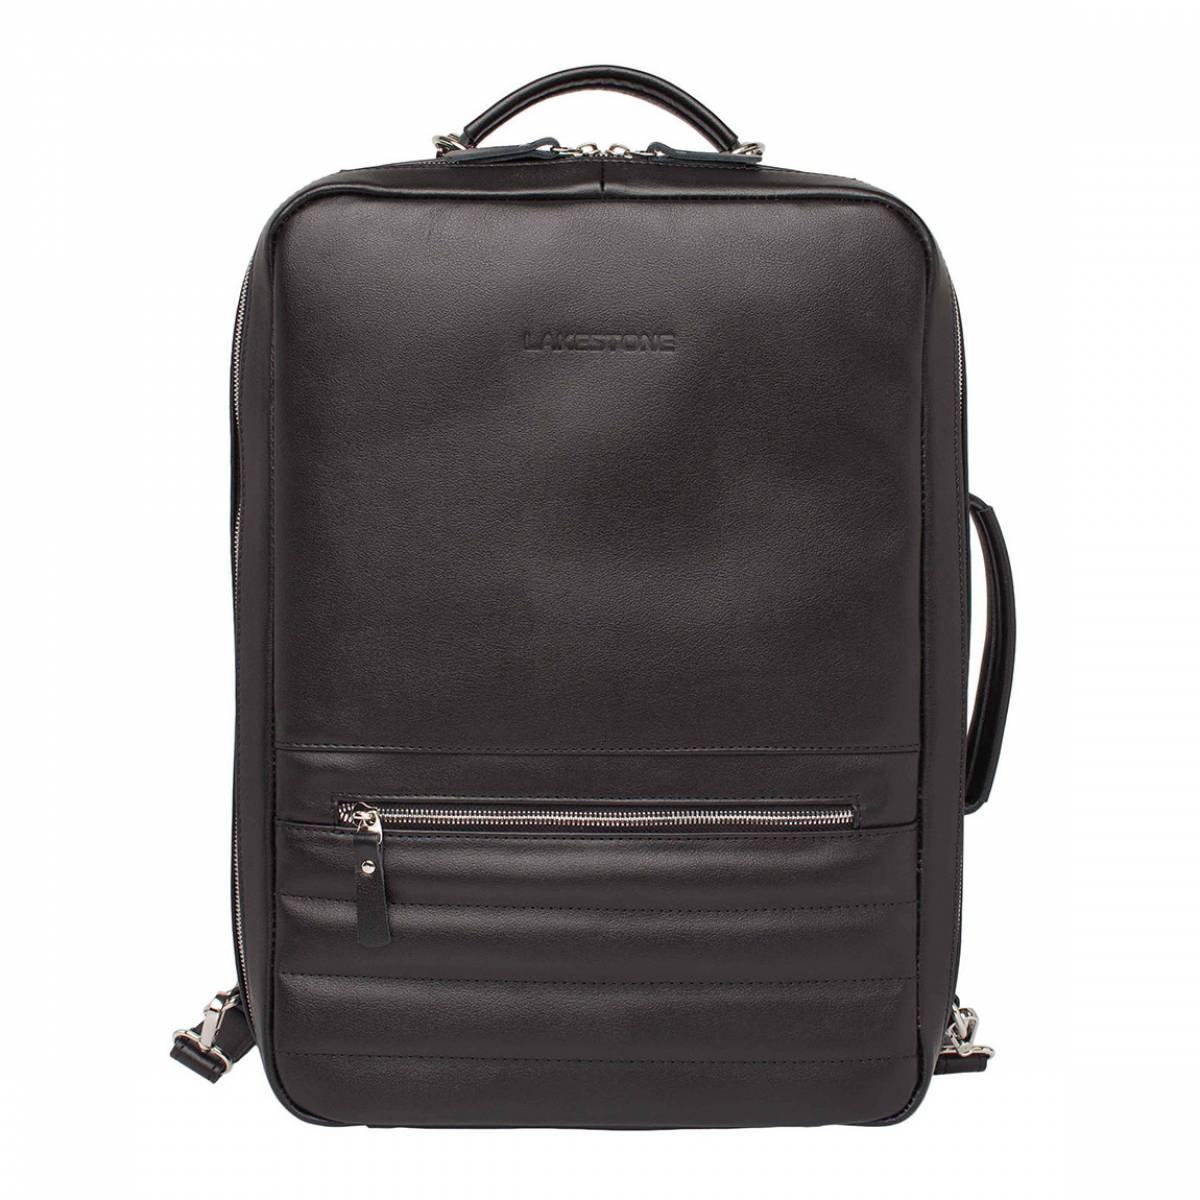 Рюкзак-трансформер для ноутбука Banister Black фото